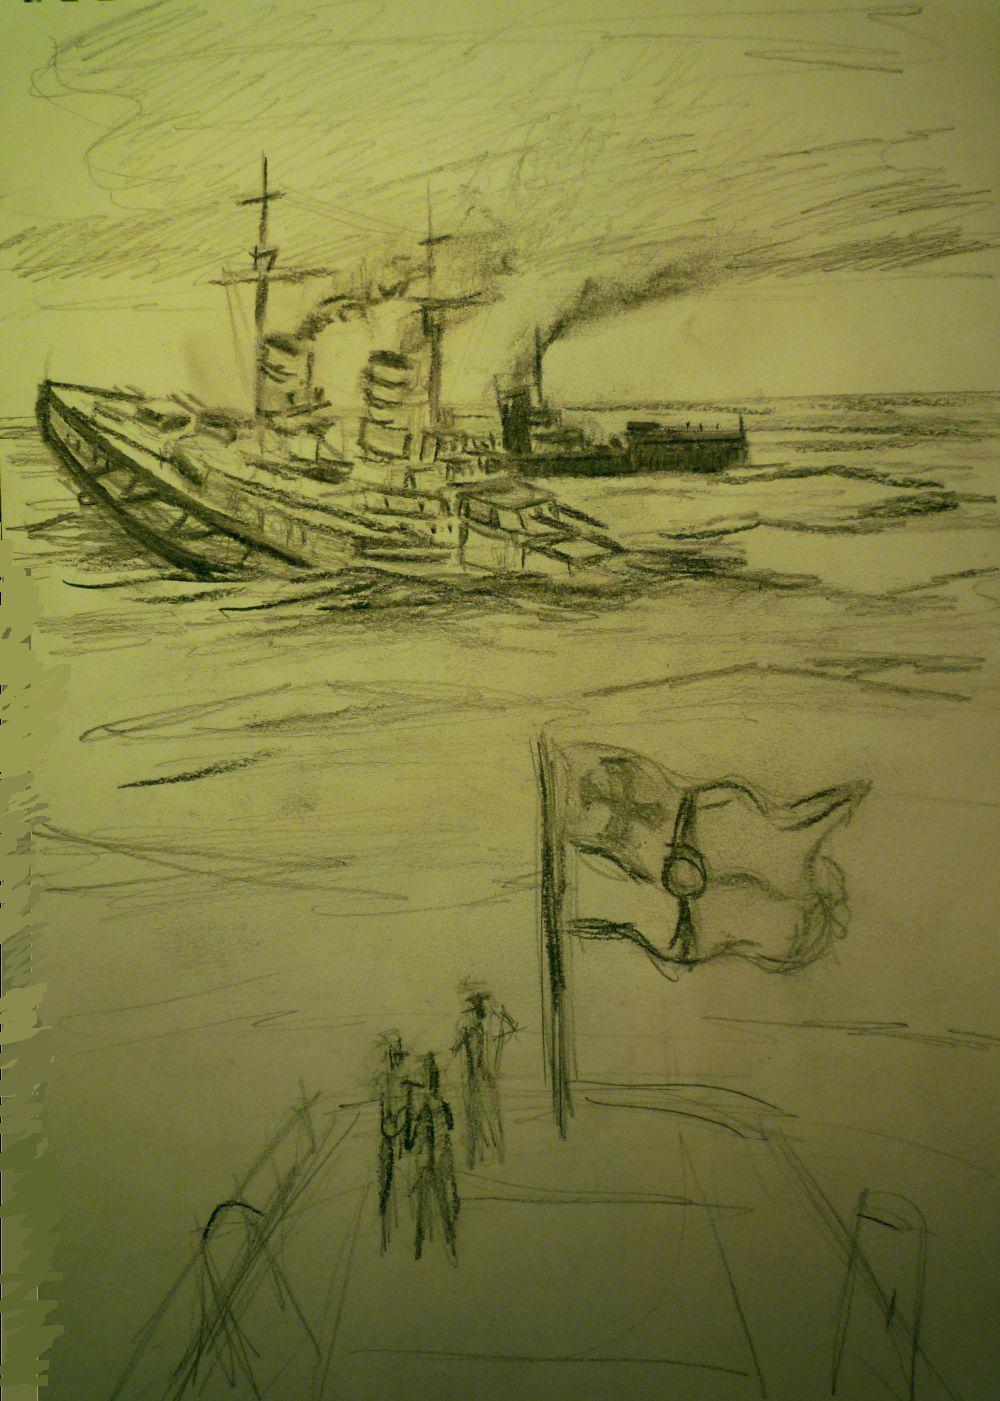 Boceto del hundimiento del SMS Lutzow con torpedo